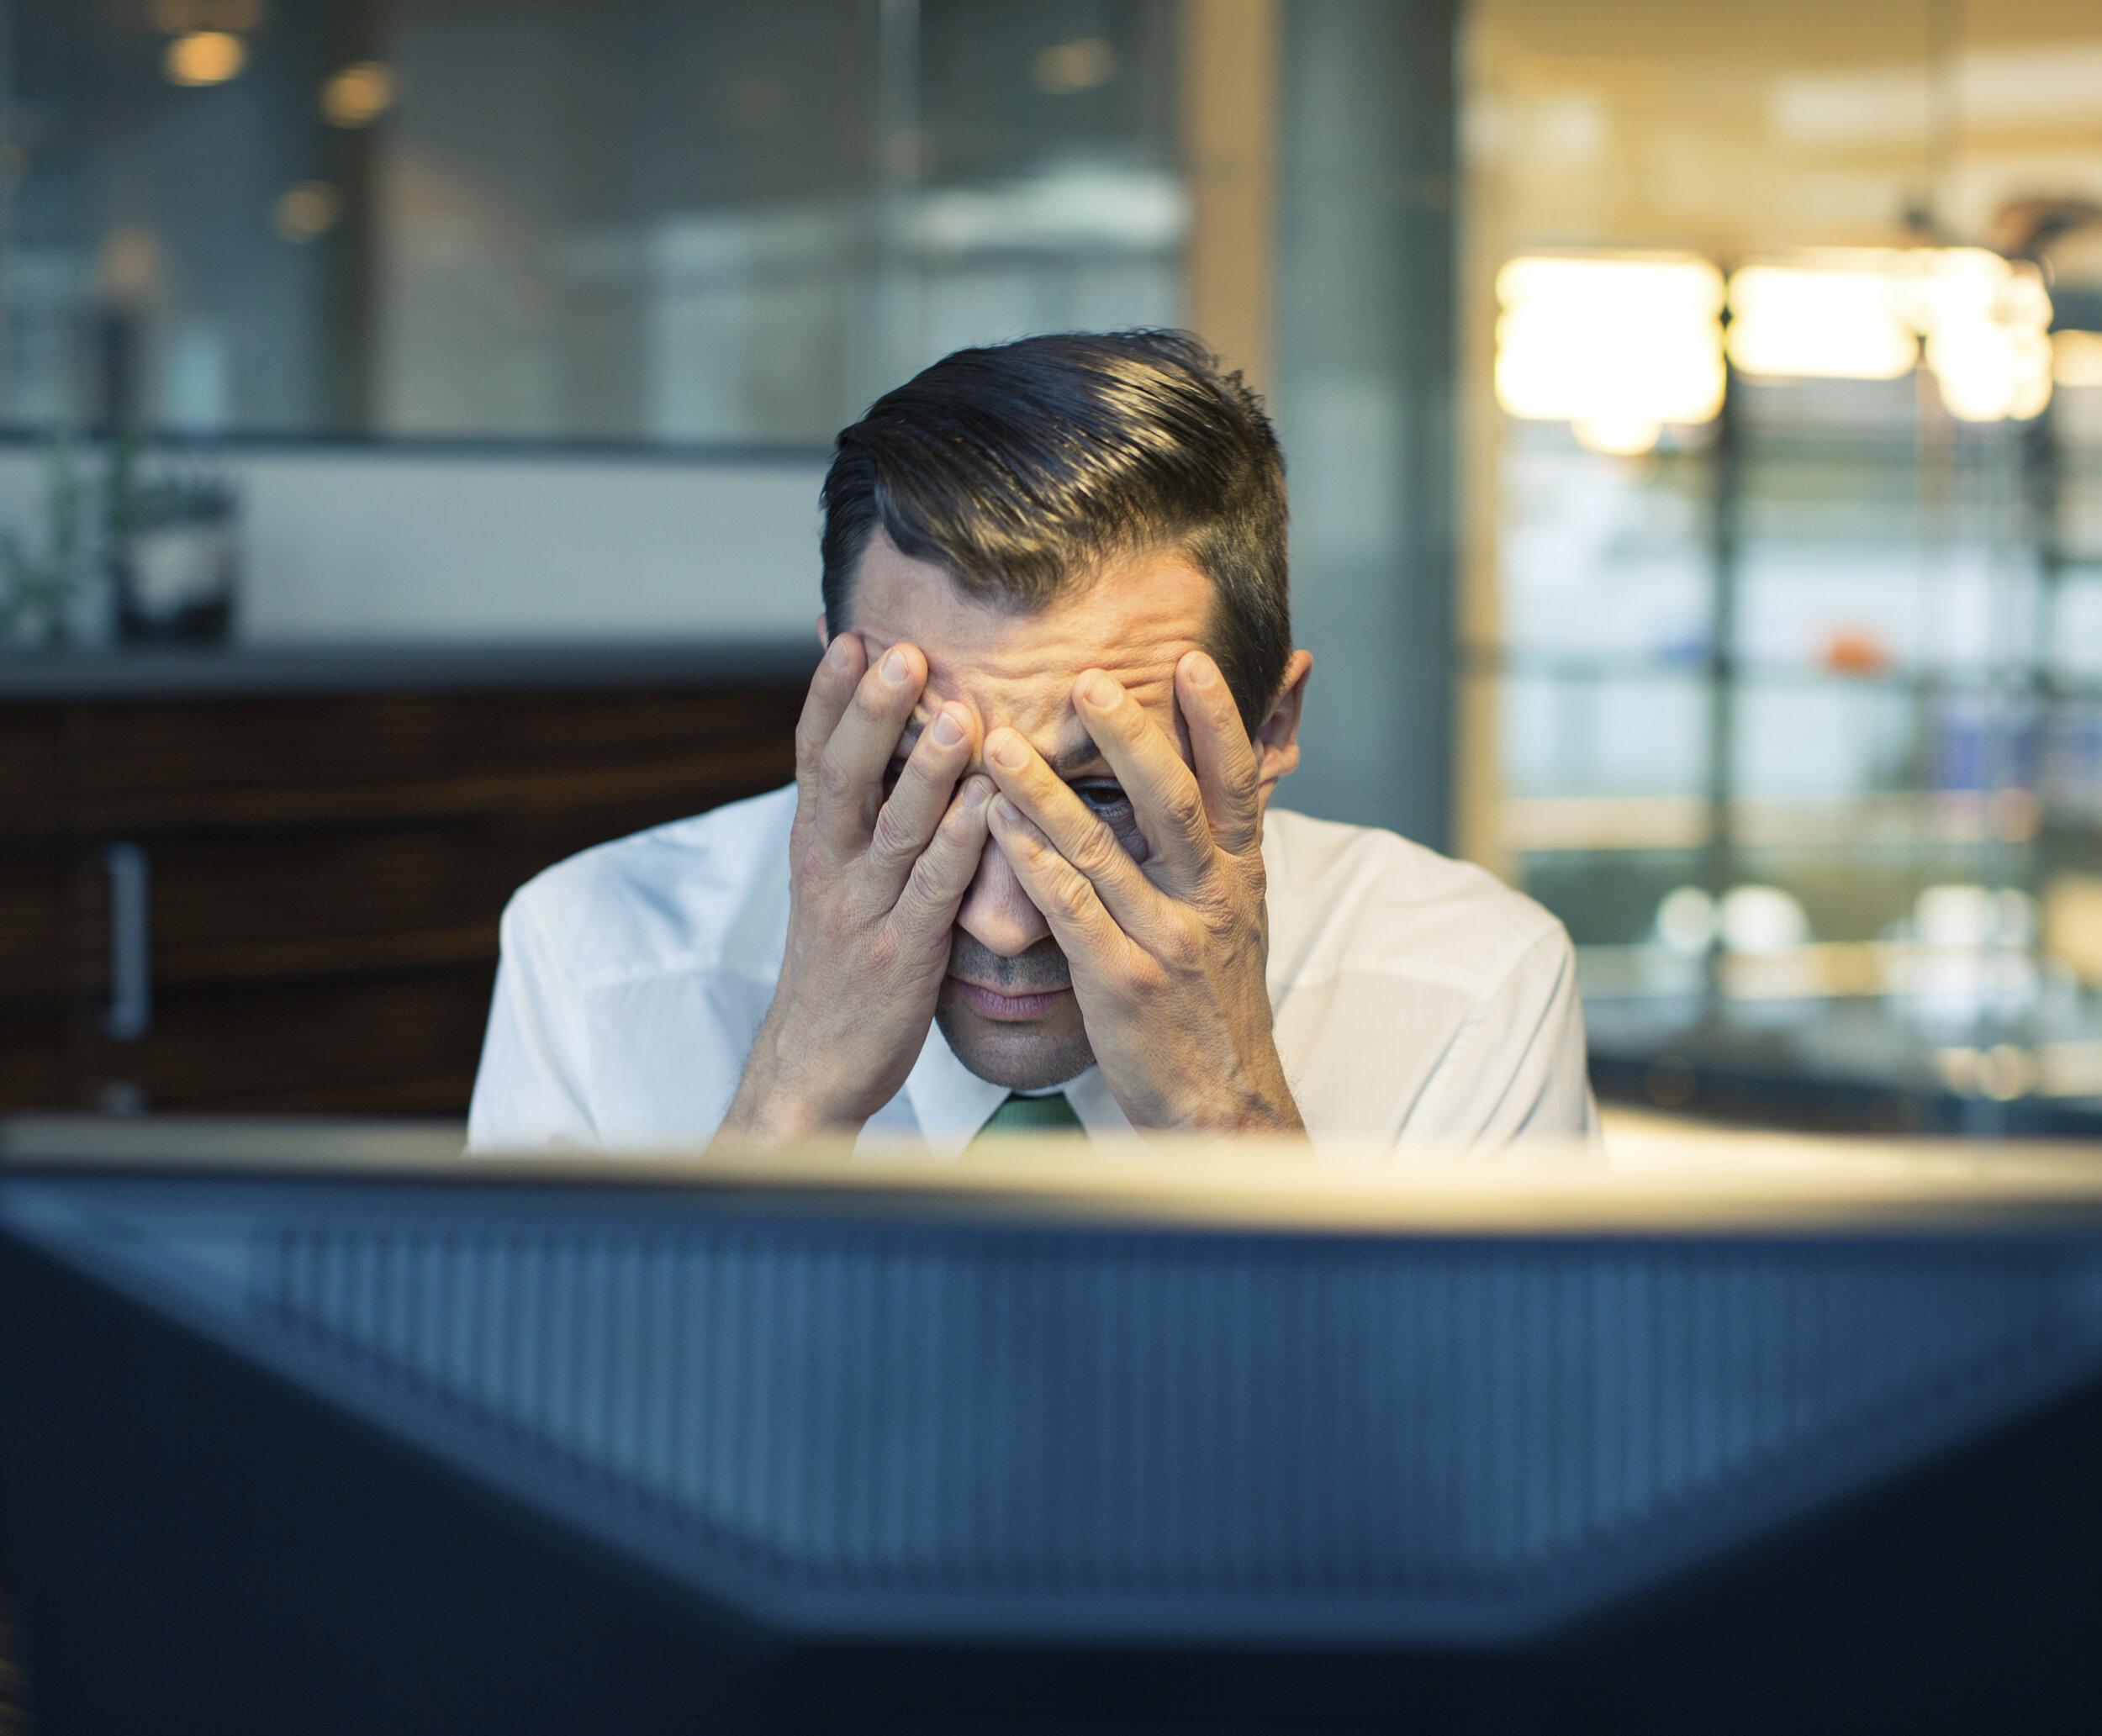 Man frustrated at computer